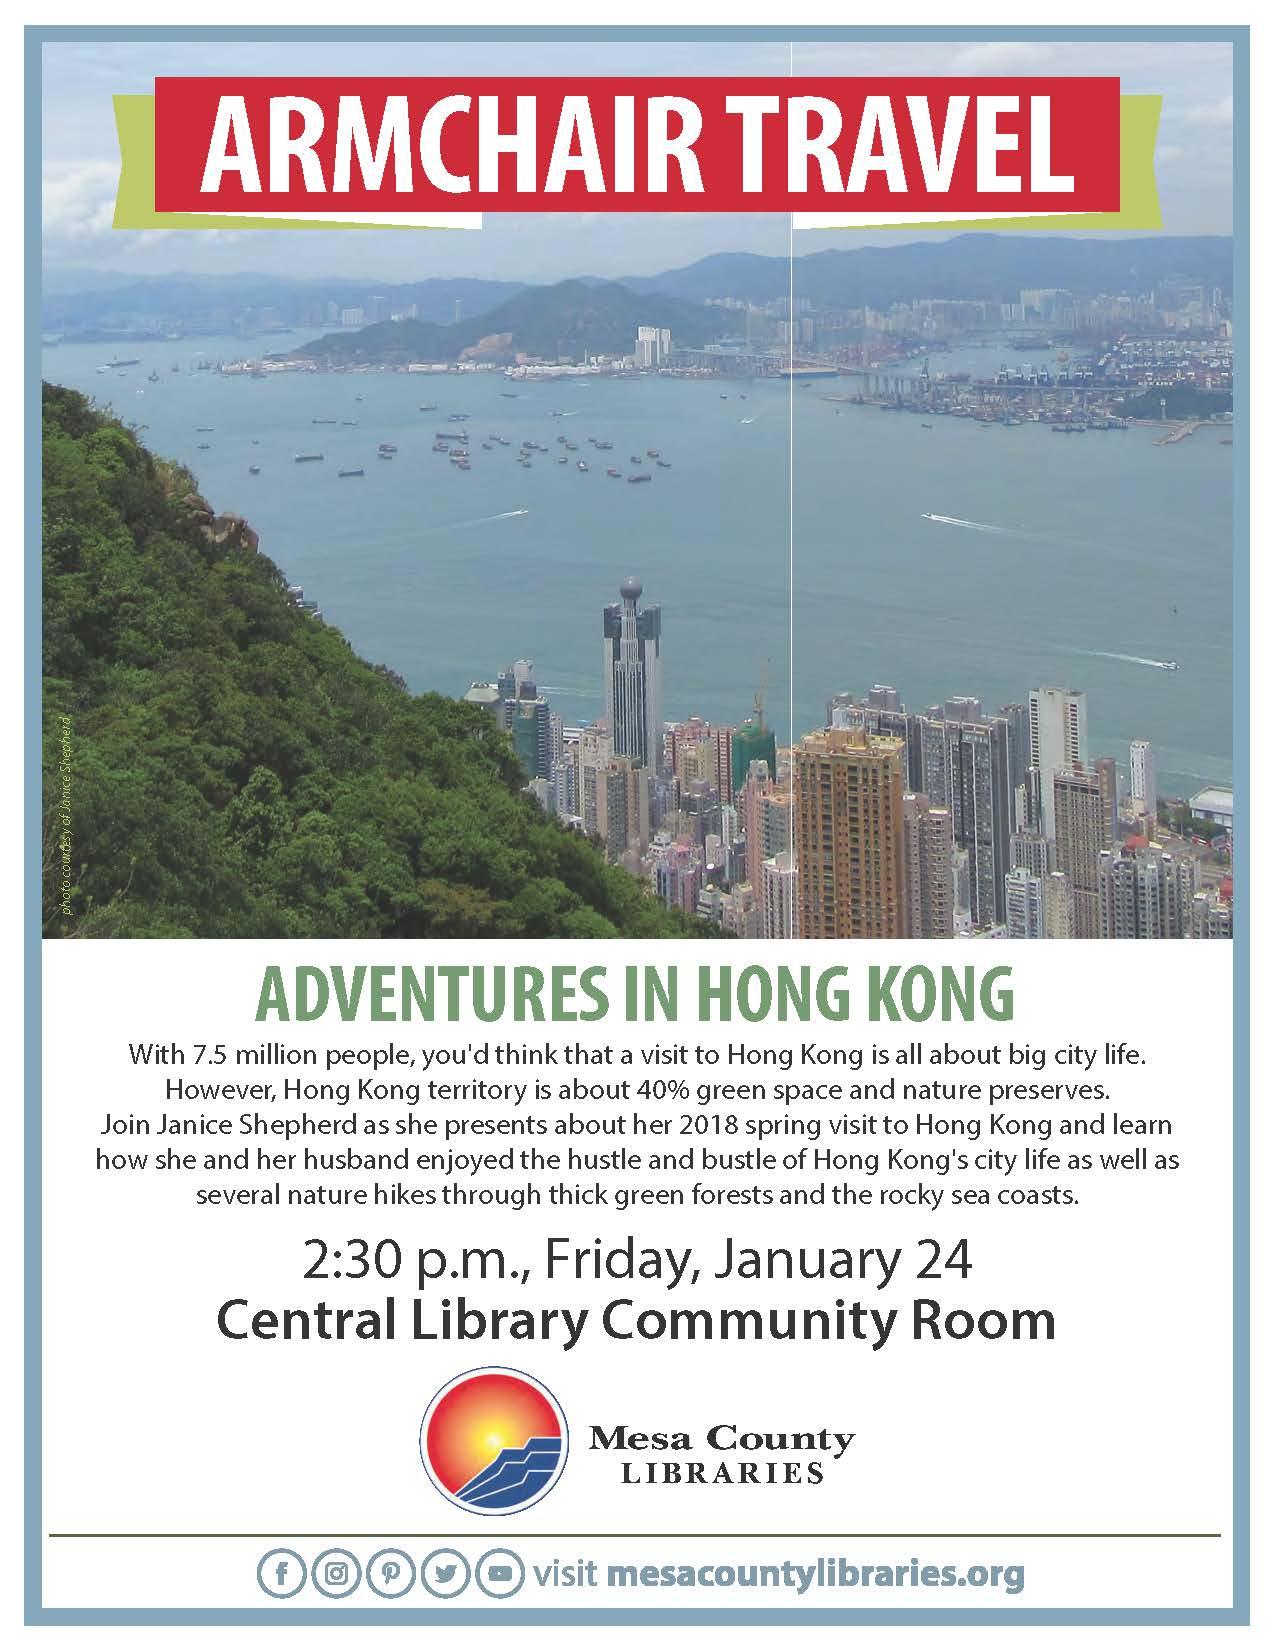 Armchair Travel: Adventures in Hong Kong